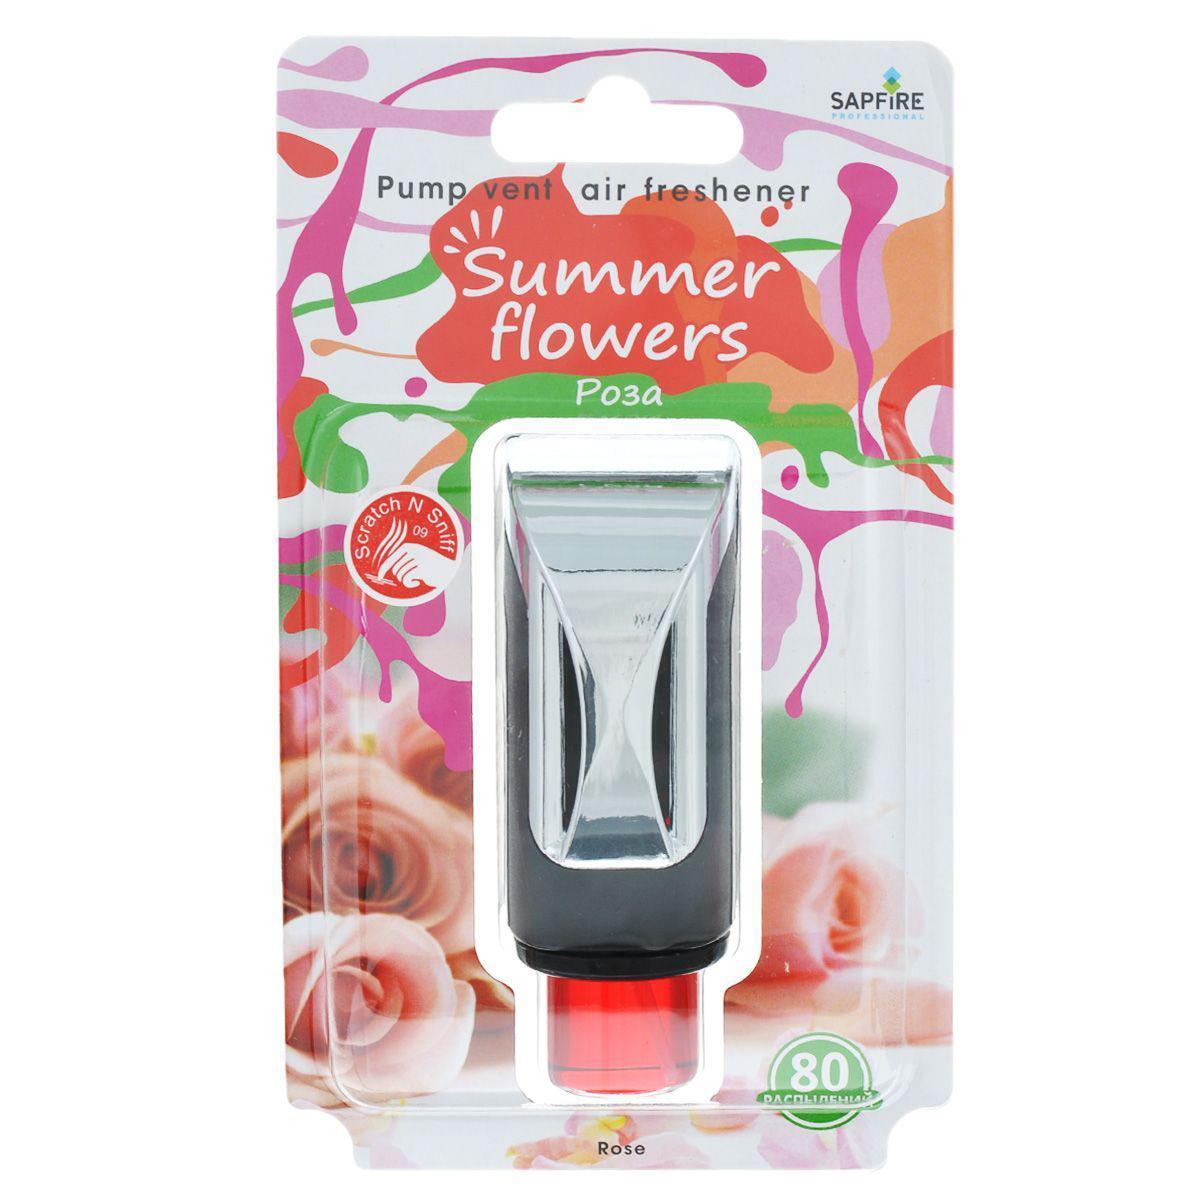 ������������ � ��������� Sapfire Summer Flowers, ���� - SapfireSAA-07881�������� ������������ Sapfire Summer Flowers ����� �������� ������ ����. ������������, ����������� �� ��������, ����������� � ��������� ������. �������������� ������������� Sapfire Summer Flowers ������� �� 80 ����������. Summer Flowers - ����� ��������� ����������������� ��������������. ����������� ���������� ����������� � ������. ������������ ������� ���������� ������ � ������� �����. ������: �������, ����������� ���������� ������� ������������, ������������. ������ �������������: 8 �� � 3 �� � 3,5 ��.